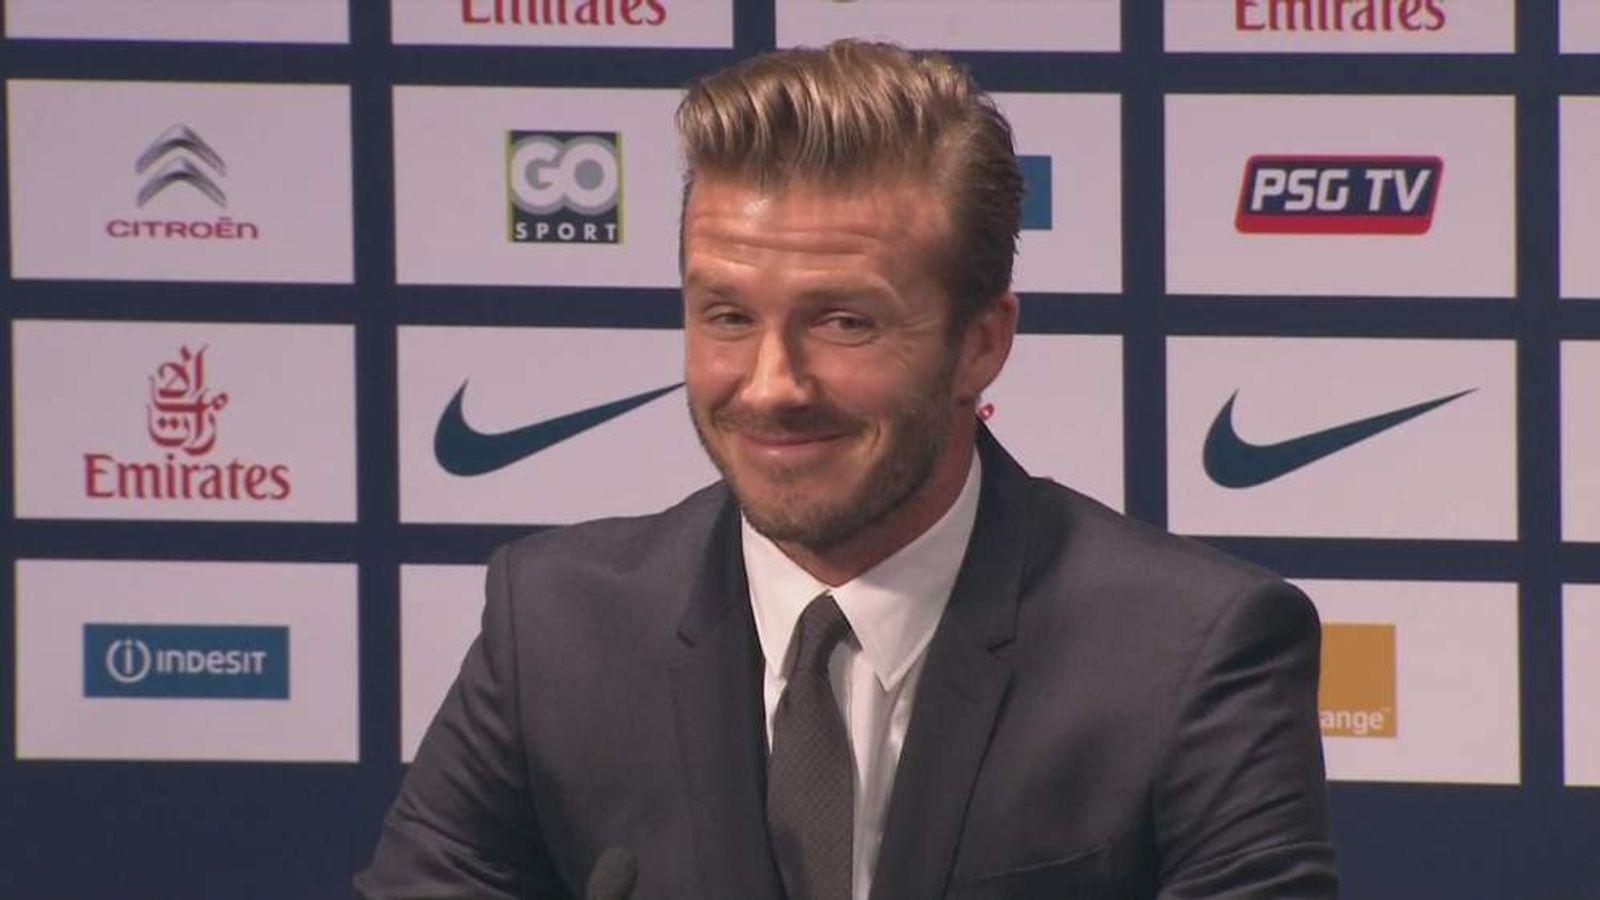 David Beckham at PSG news conference